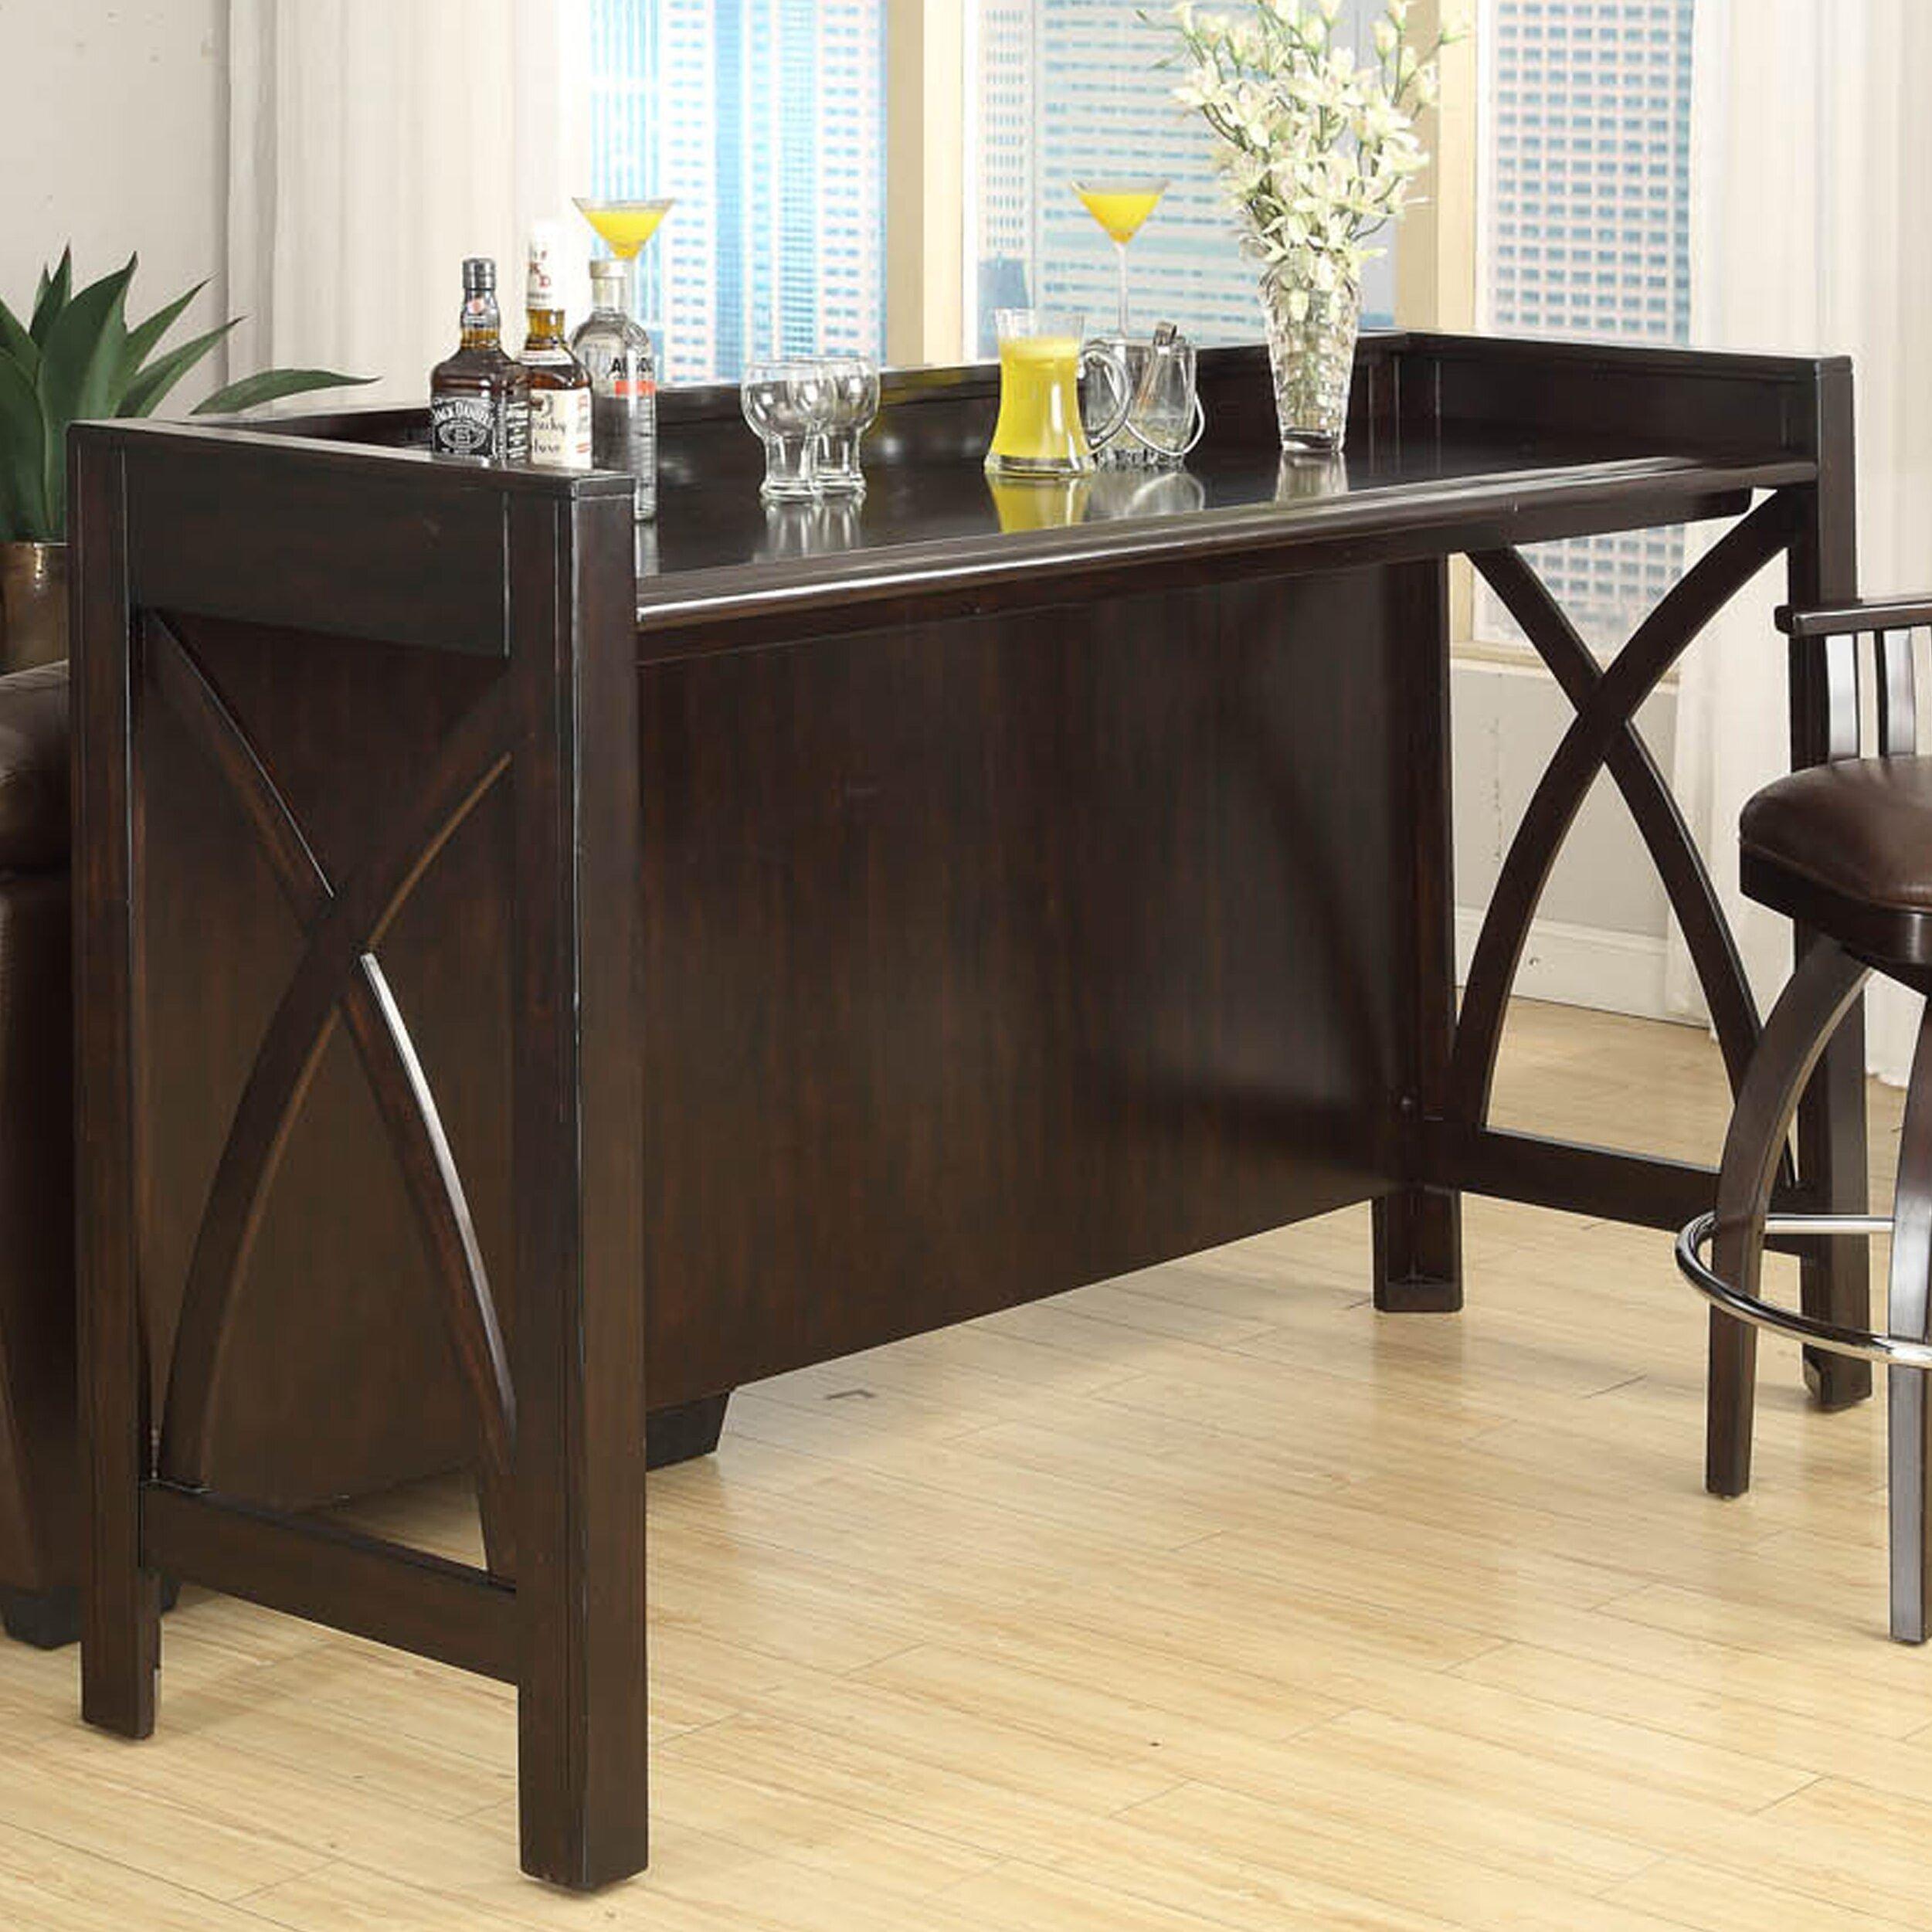 ECI Furniture Home Theatre Bar & Reviews